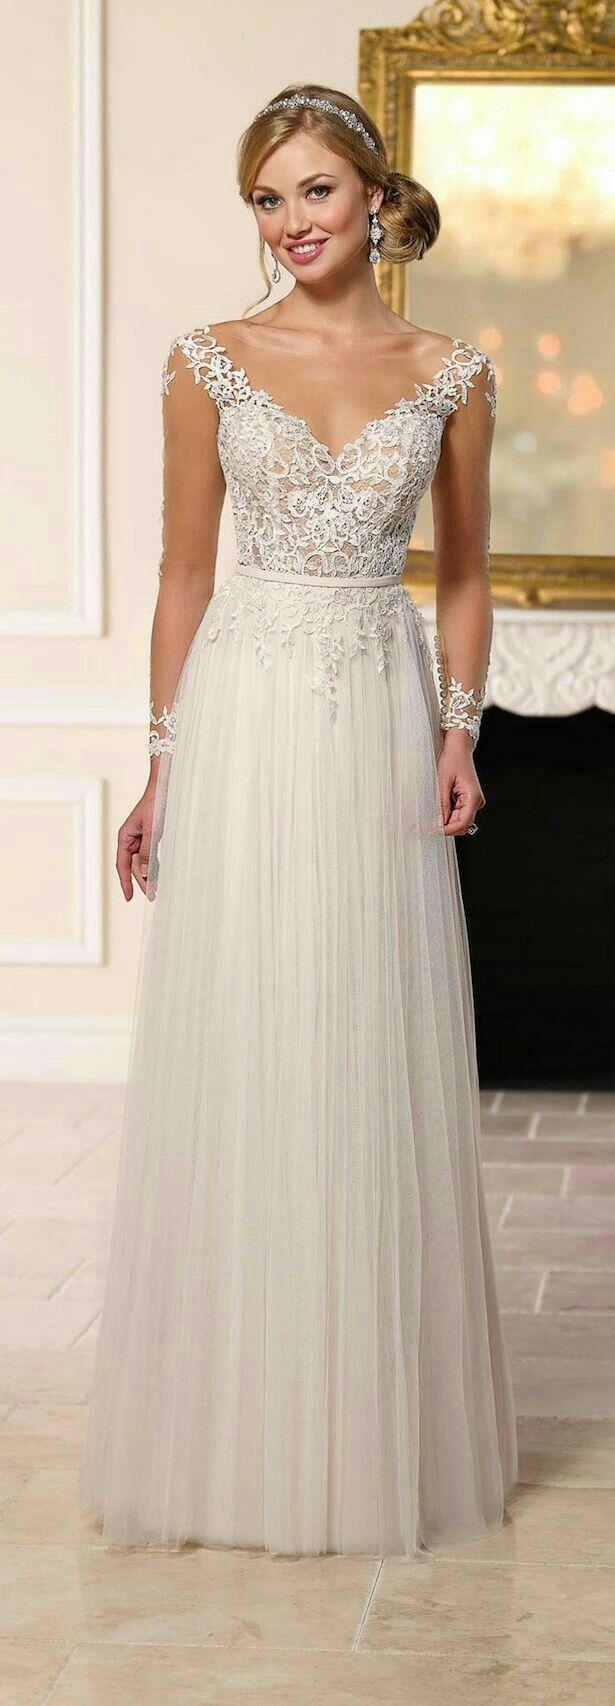 Vestido de noiva | Vestiditos | Pinterest | Hochzeitskleidung ...